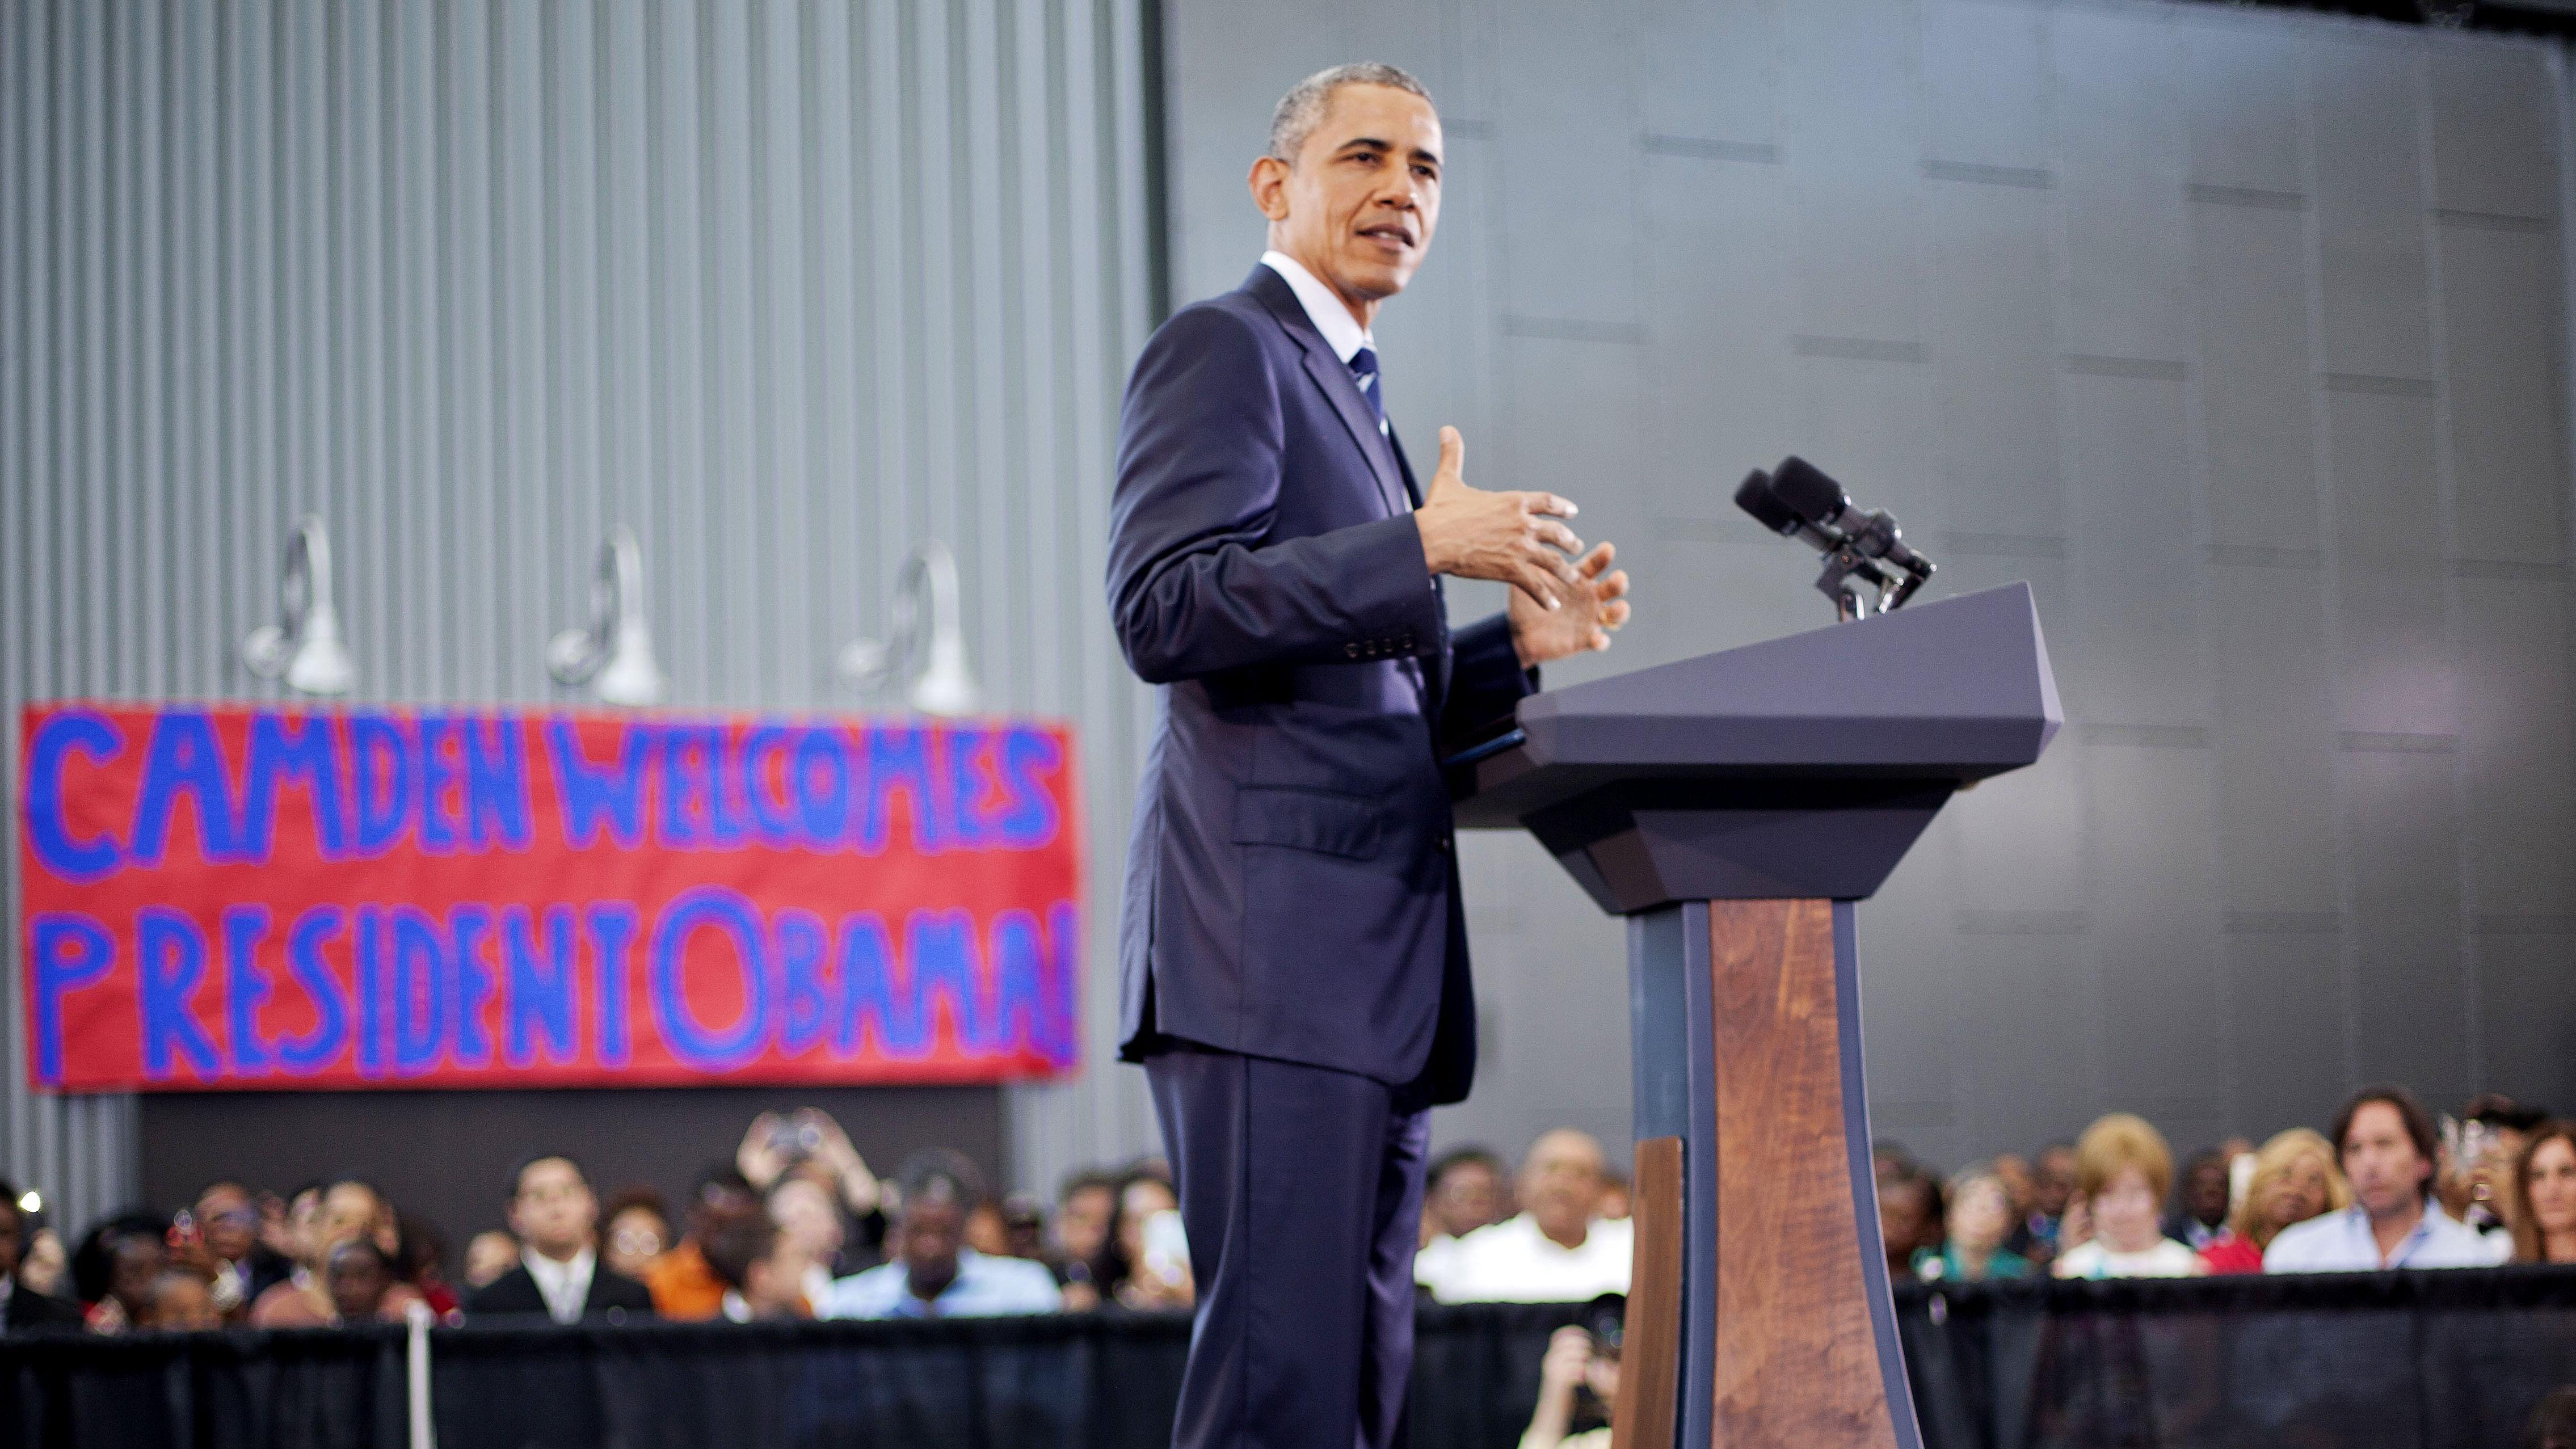 Obama: U.S. Cracking Down on 'Militarization' of Local Police